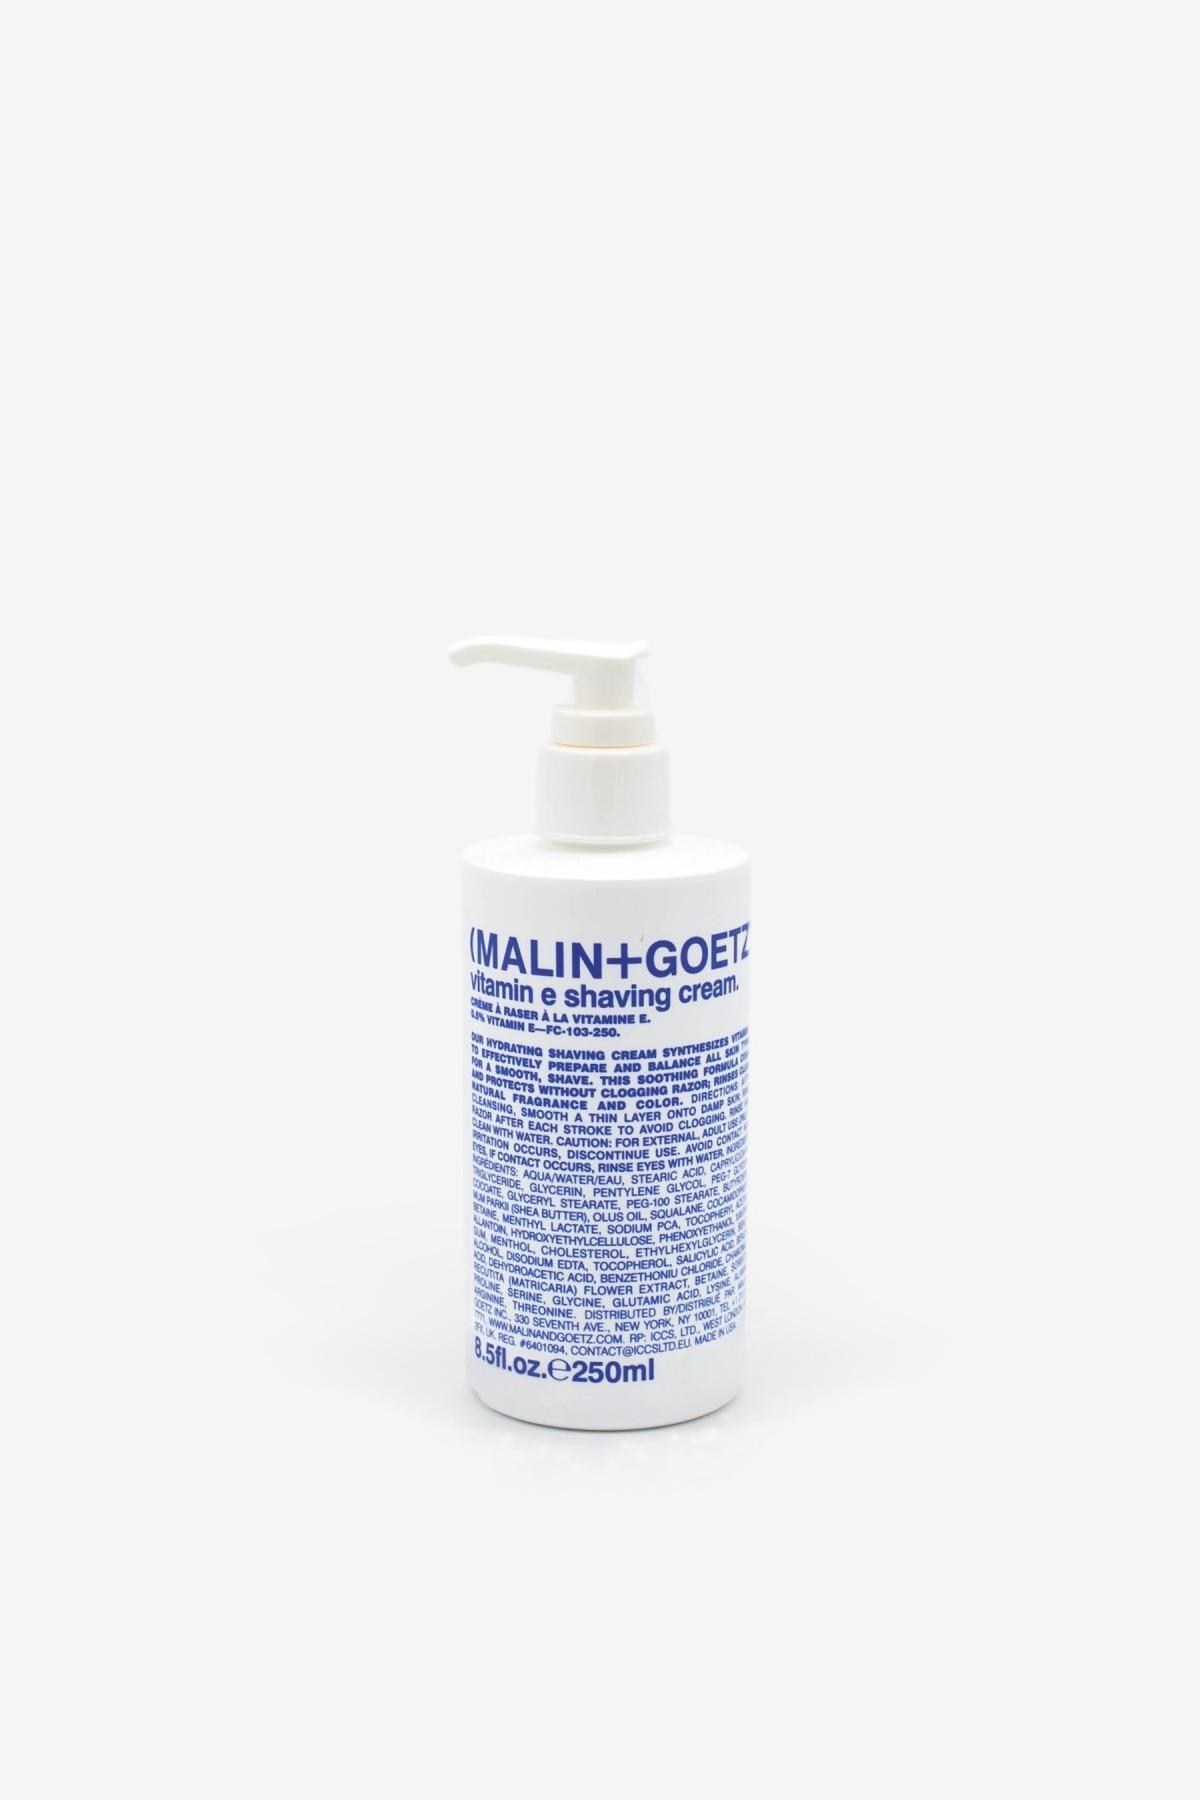 Malin+Goetz Vitamin E Shaving Cream 250ml in